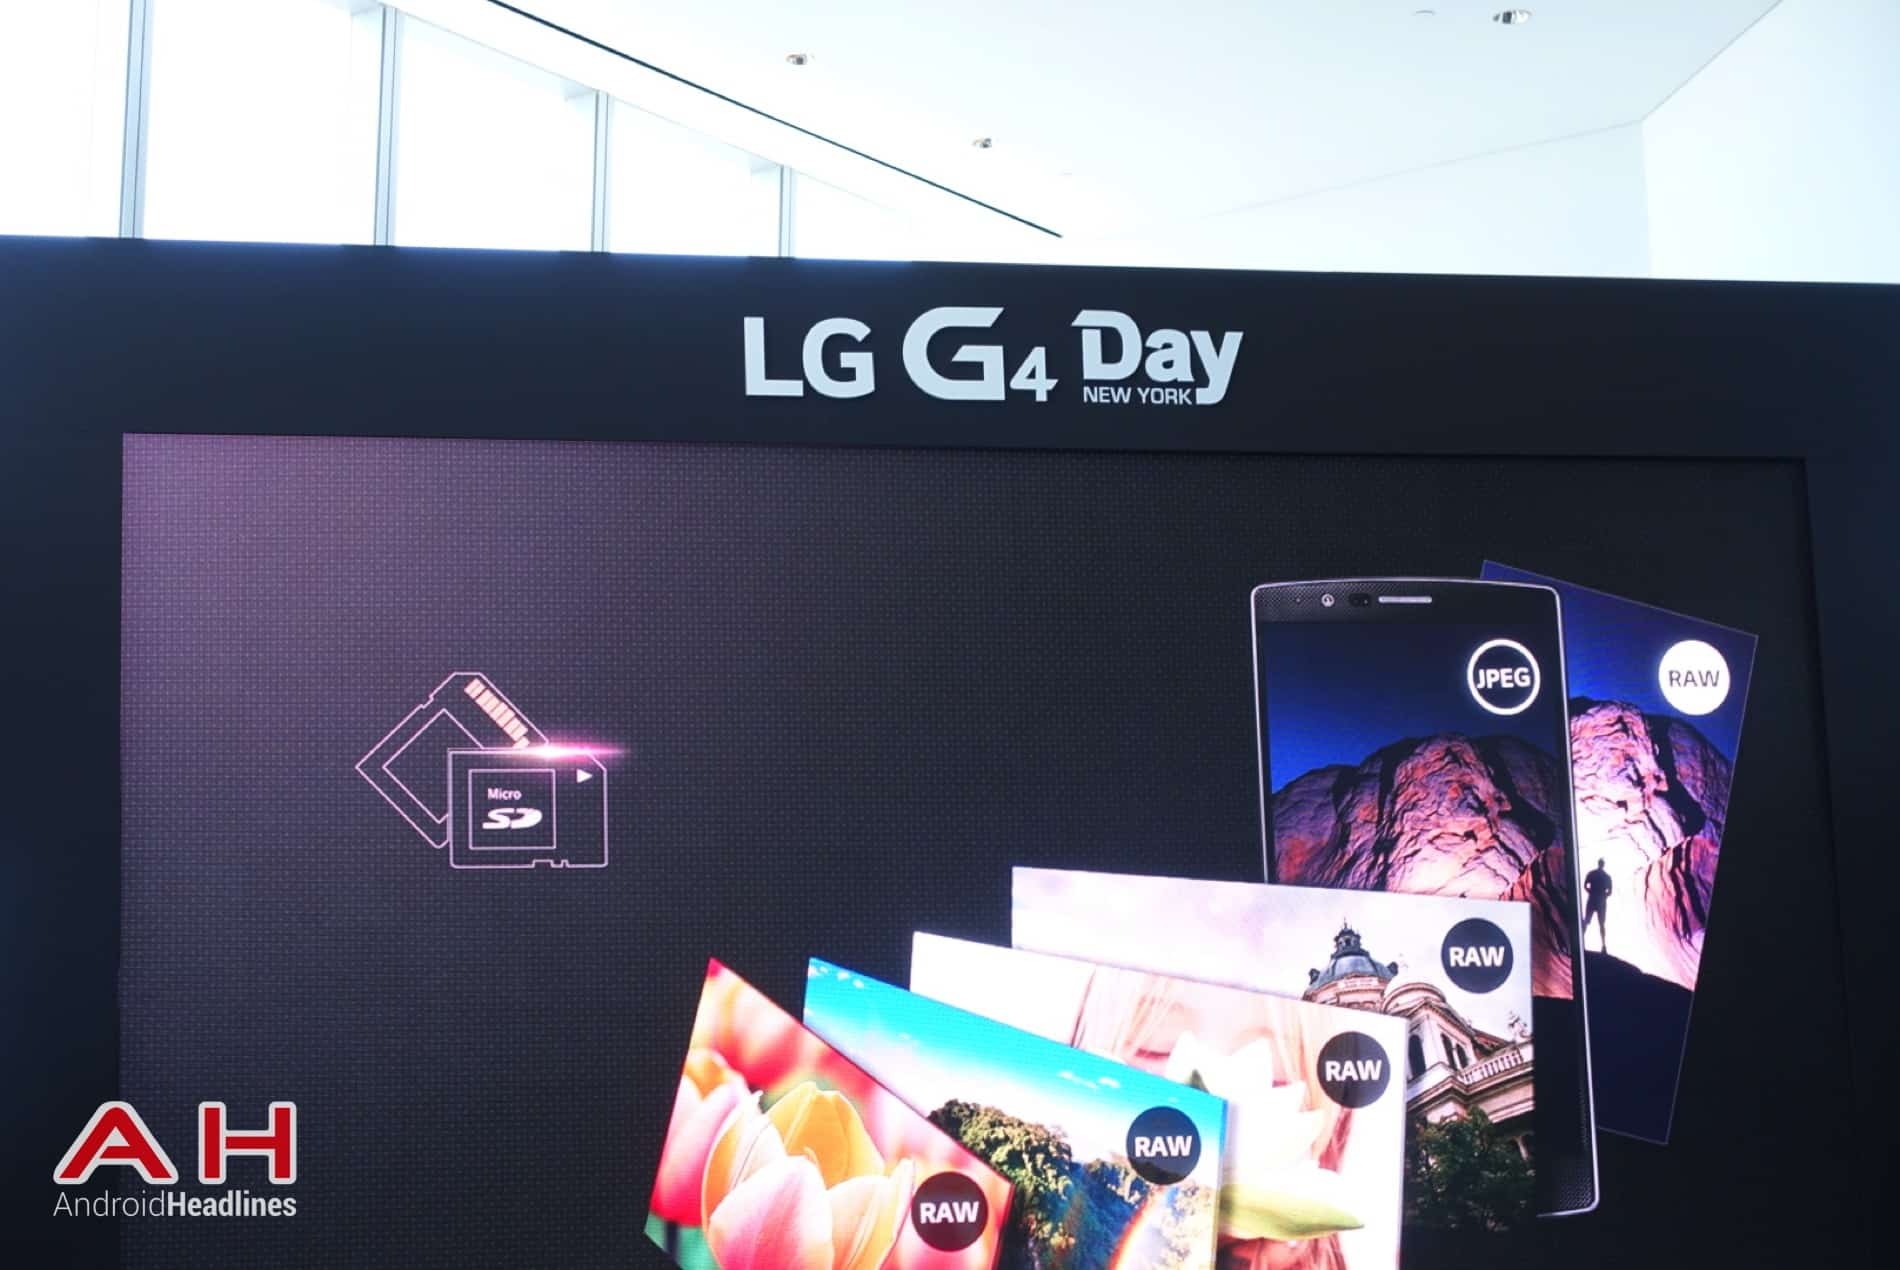 LG G4 Day AH 03 191